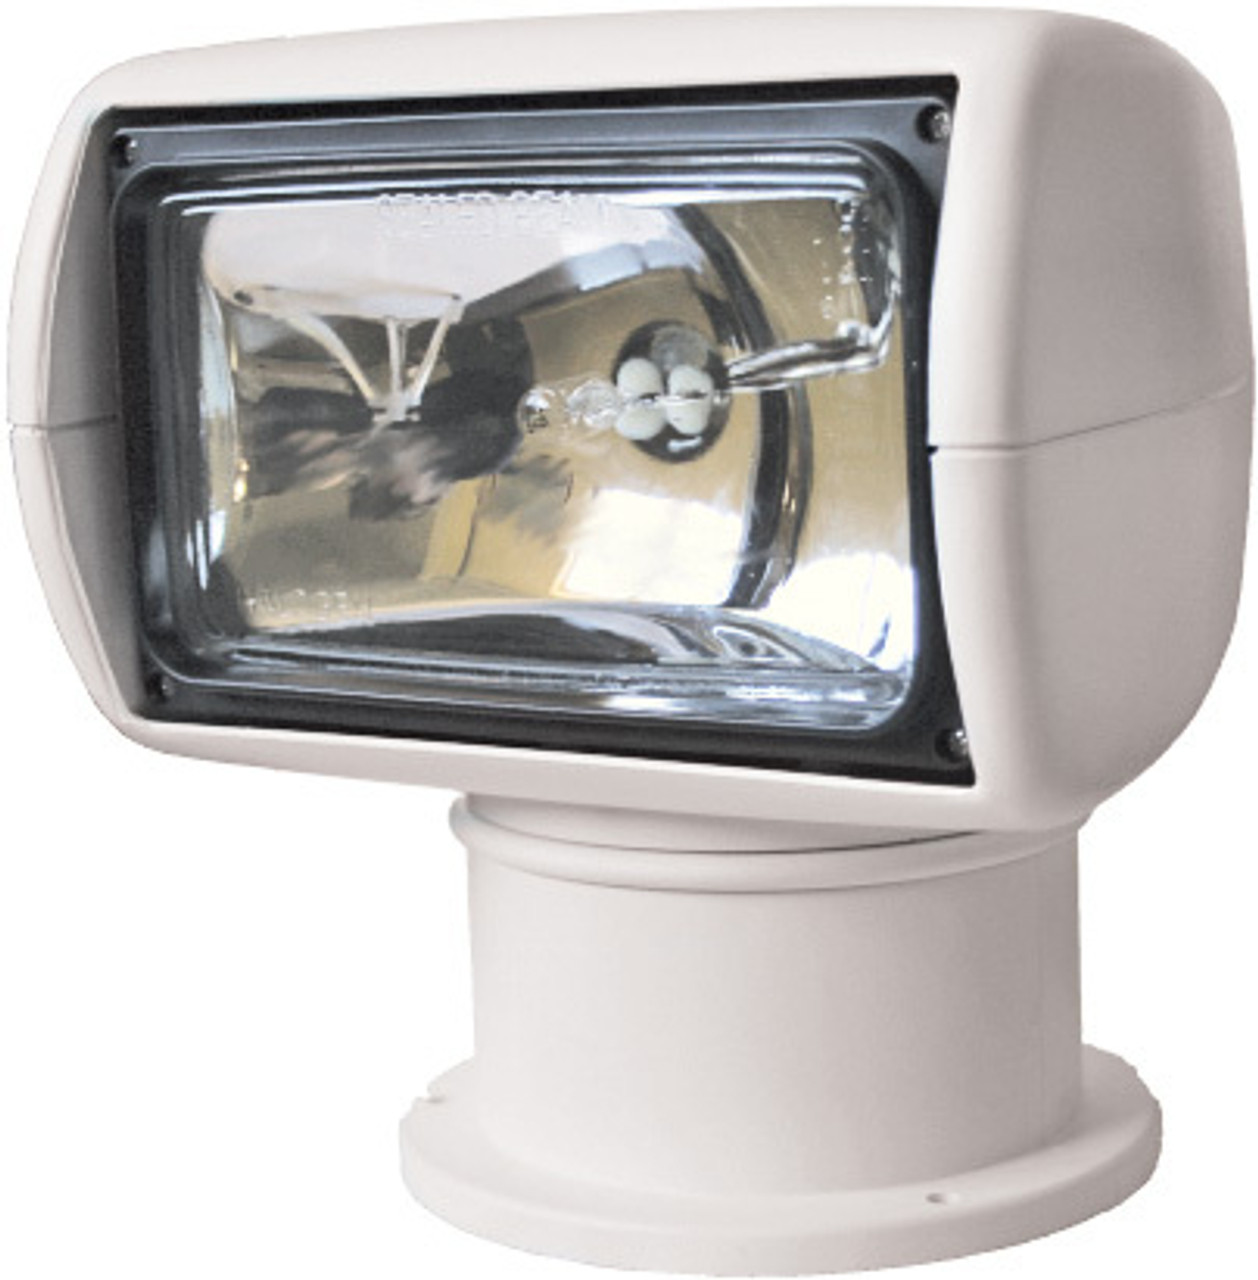 135SL Remove Control Searchlight Electronic Panel 24v